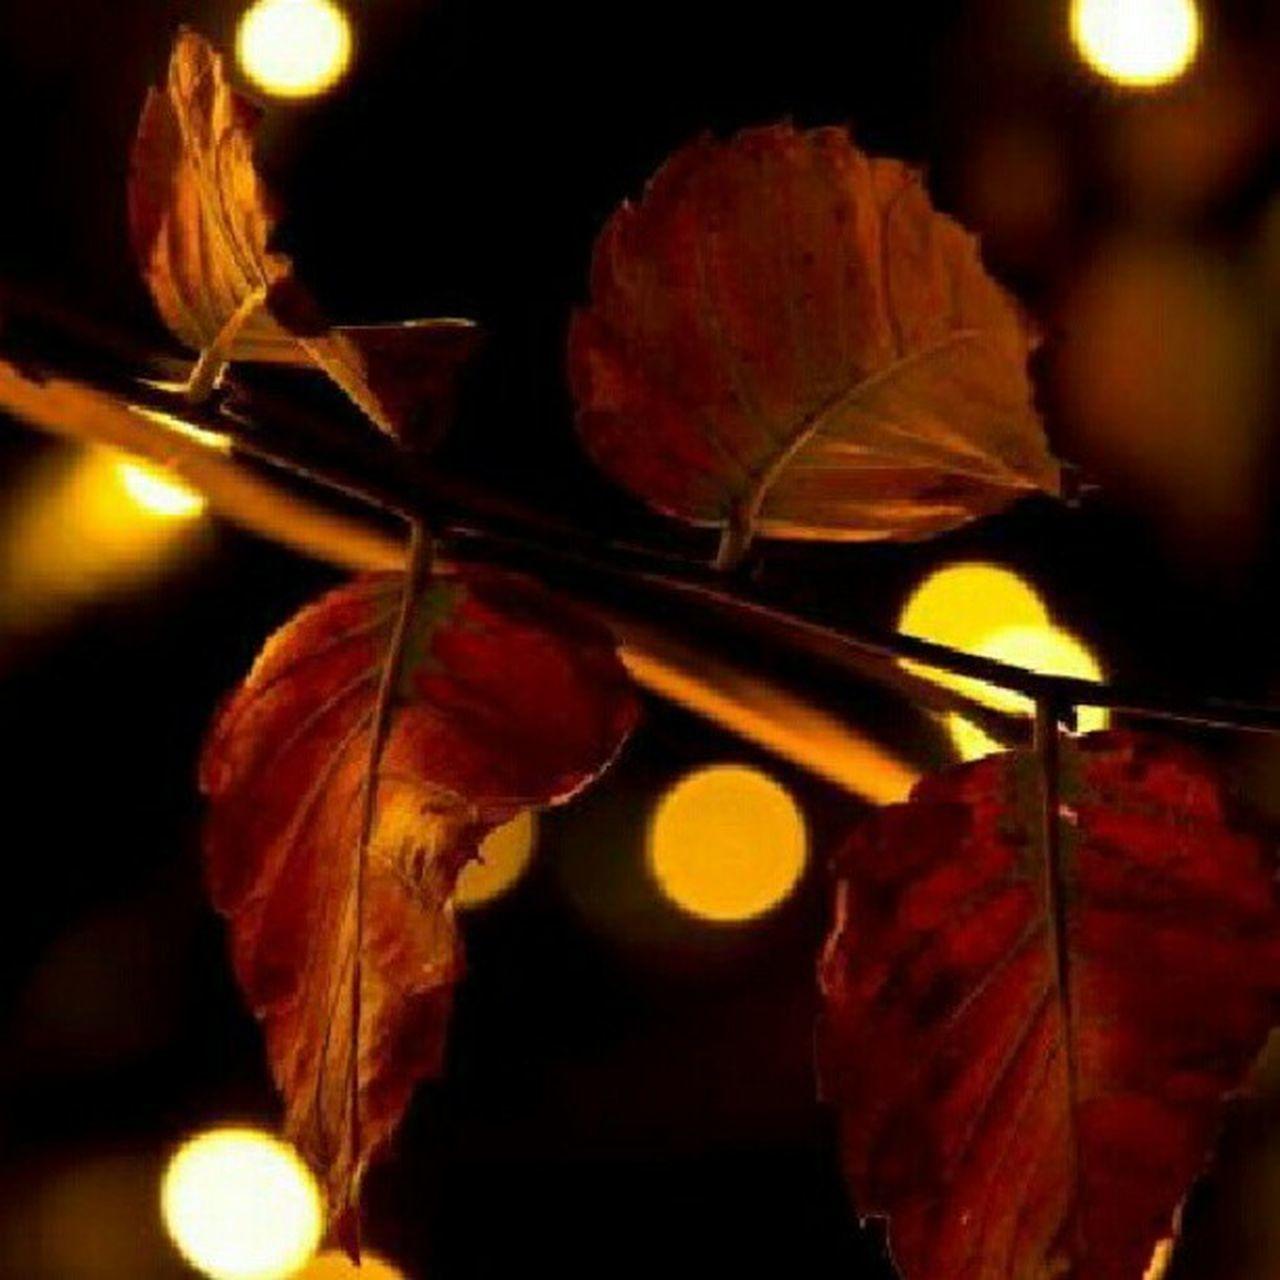 Autumn Nights in Nagoya Autumn Bokeh Bokehlovers Leaves Leaf Nightphotography Night Nagoya Igersjapan Japanphotography Japan Canon Gf_daily Clubpirates Gang_family Instagram Instamood Instagood Instafamous Instagramhub